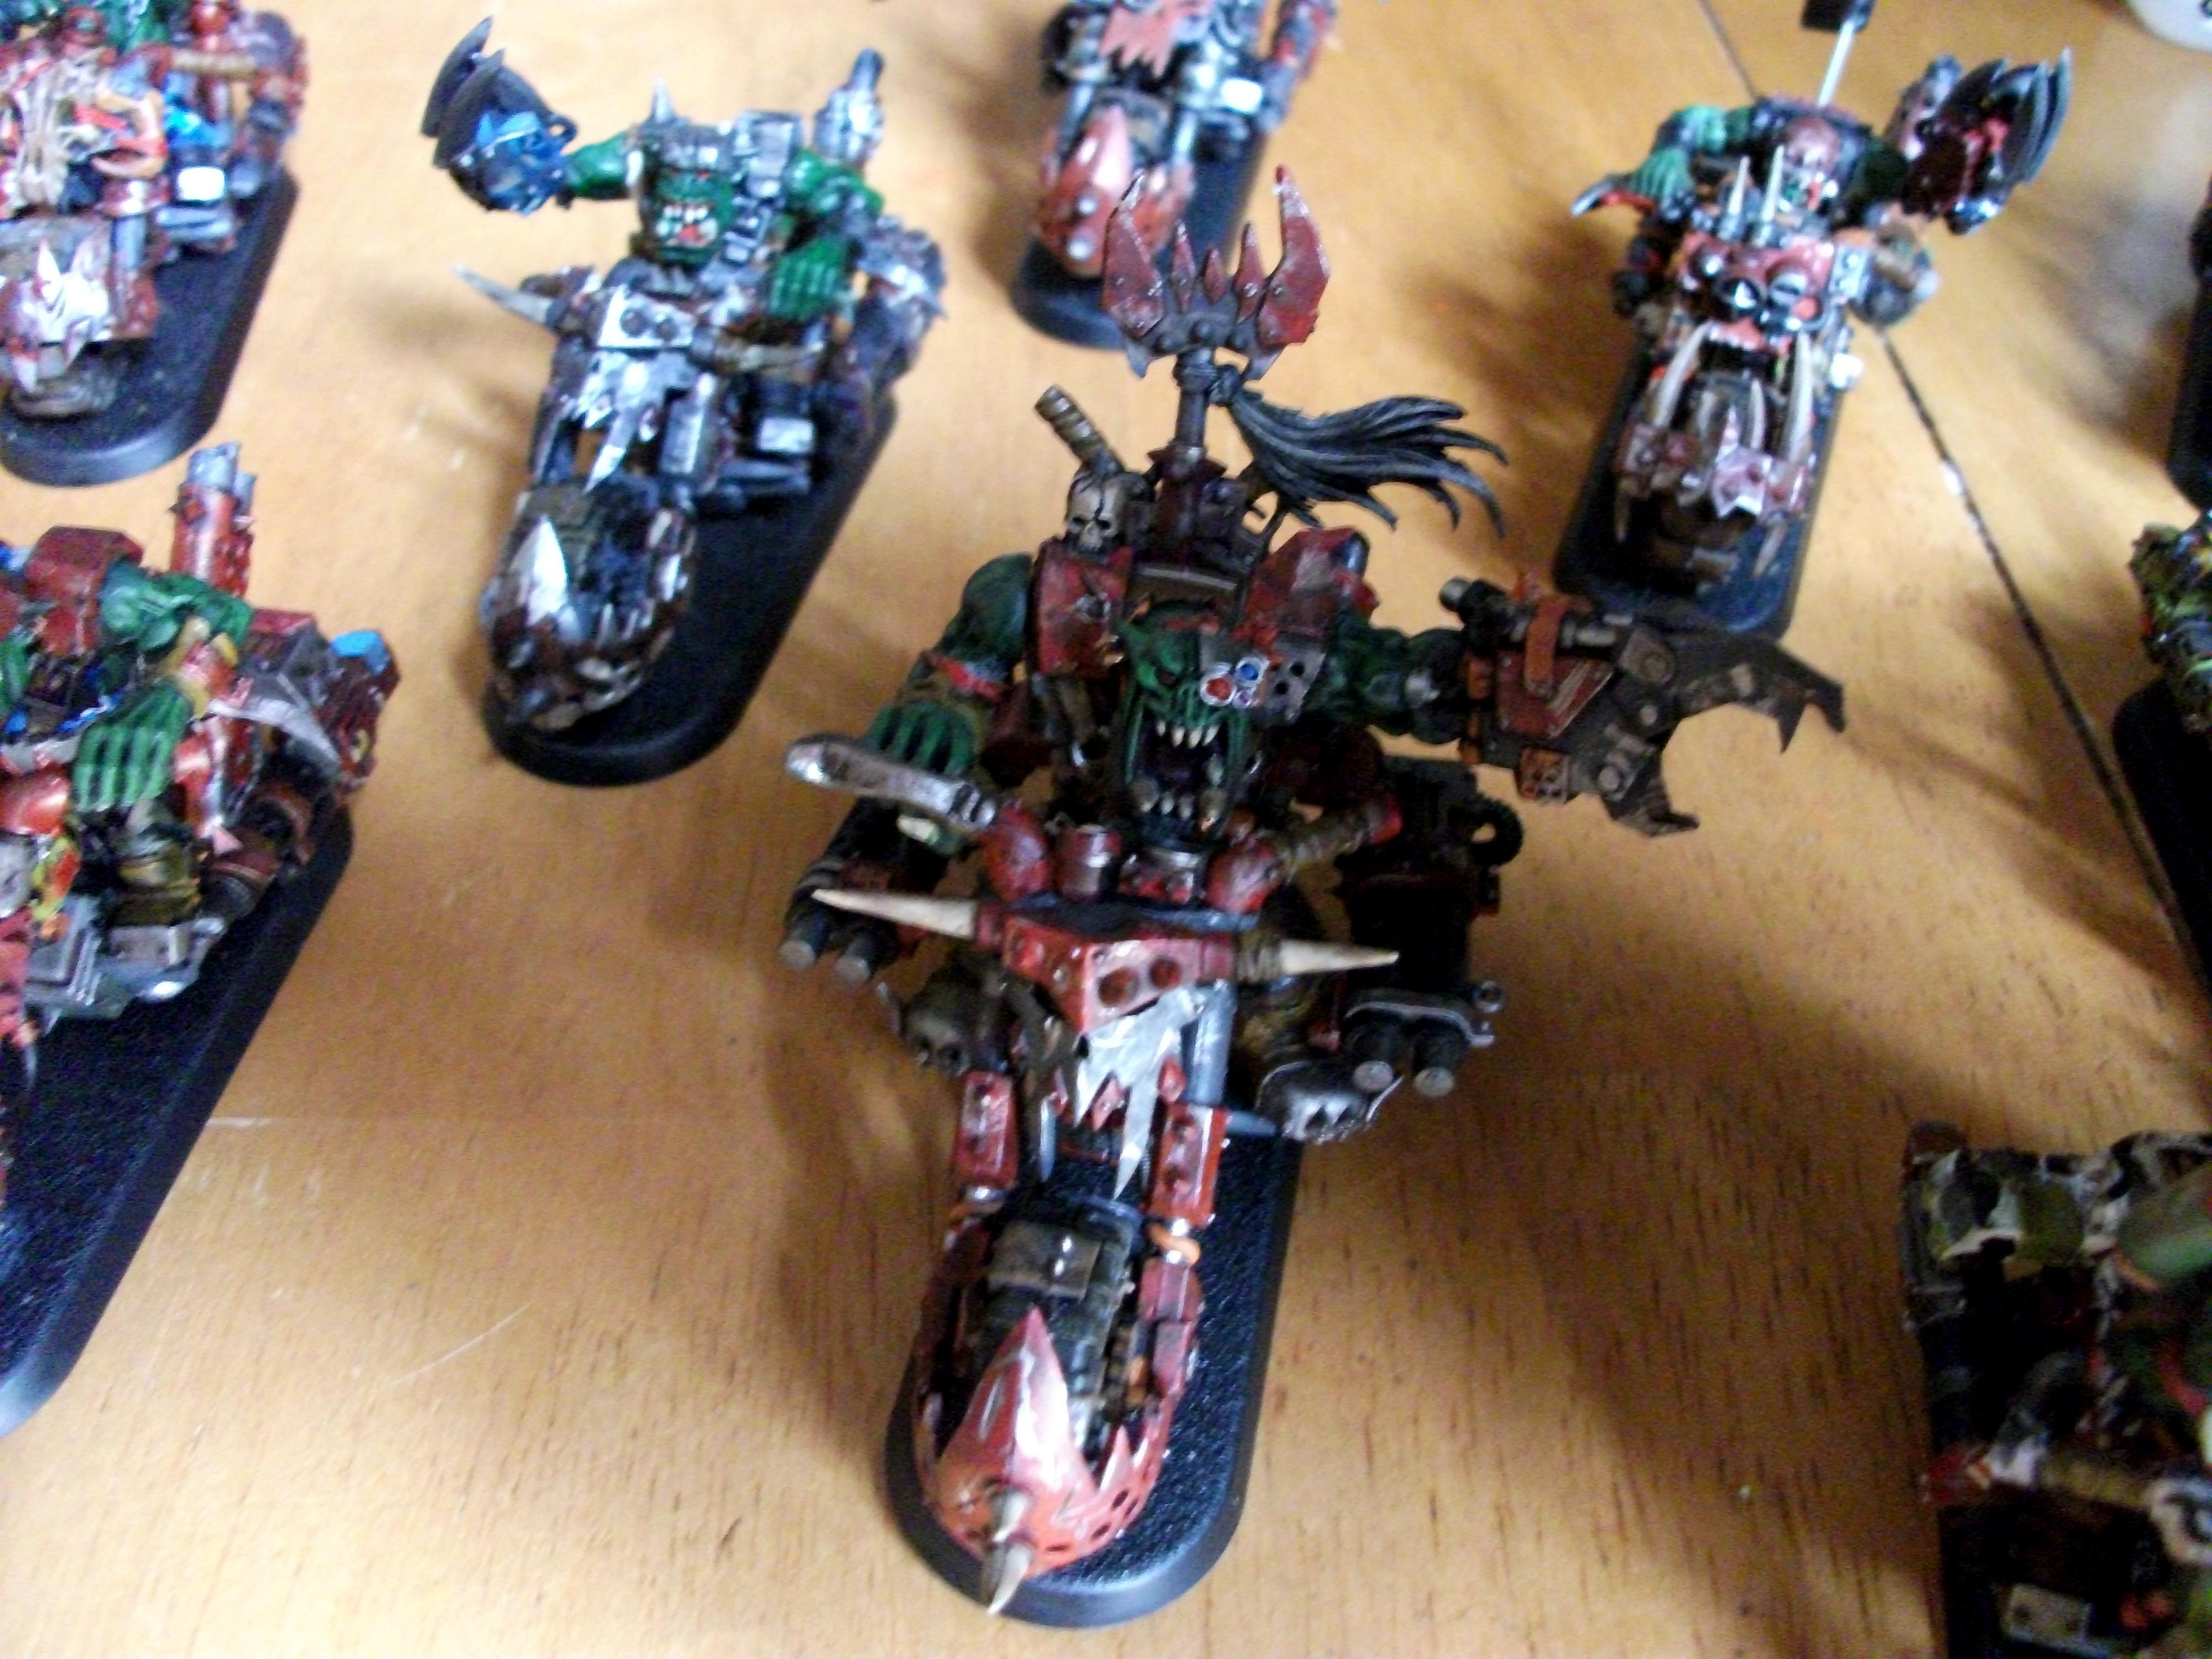 Nob Biker, Nob Warbiker, Orks, War Biker, Warbike, Warbiker, Warboss, Warboss Biker, Warboss Warbiker